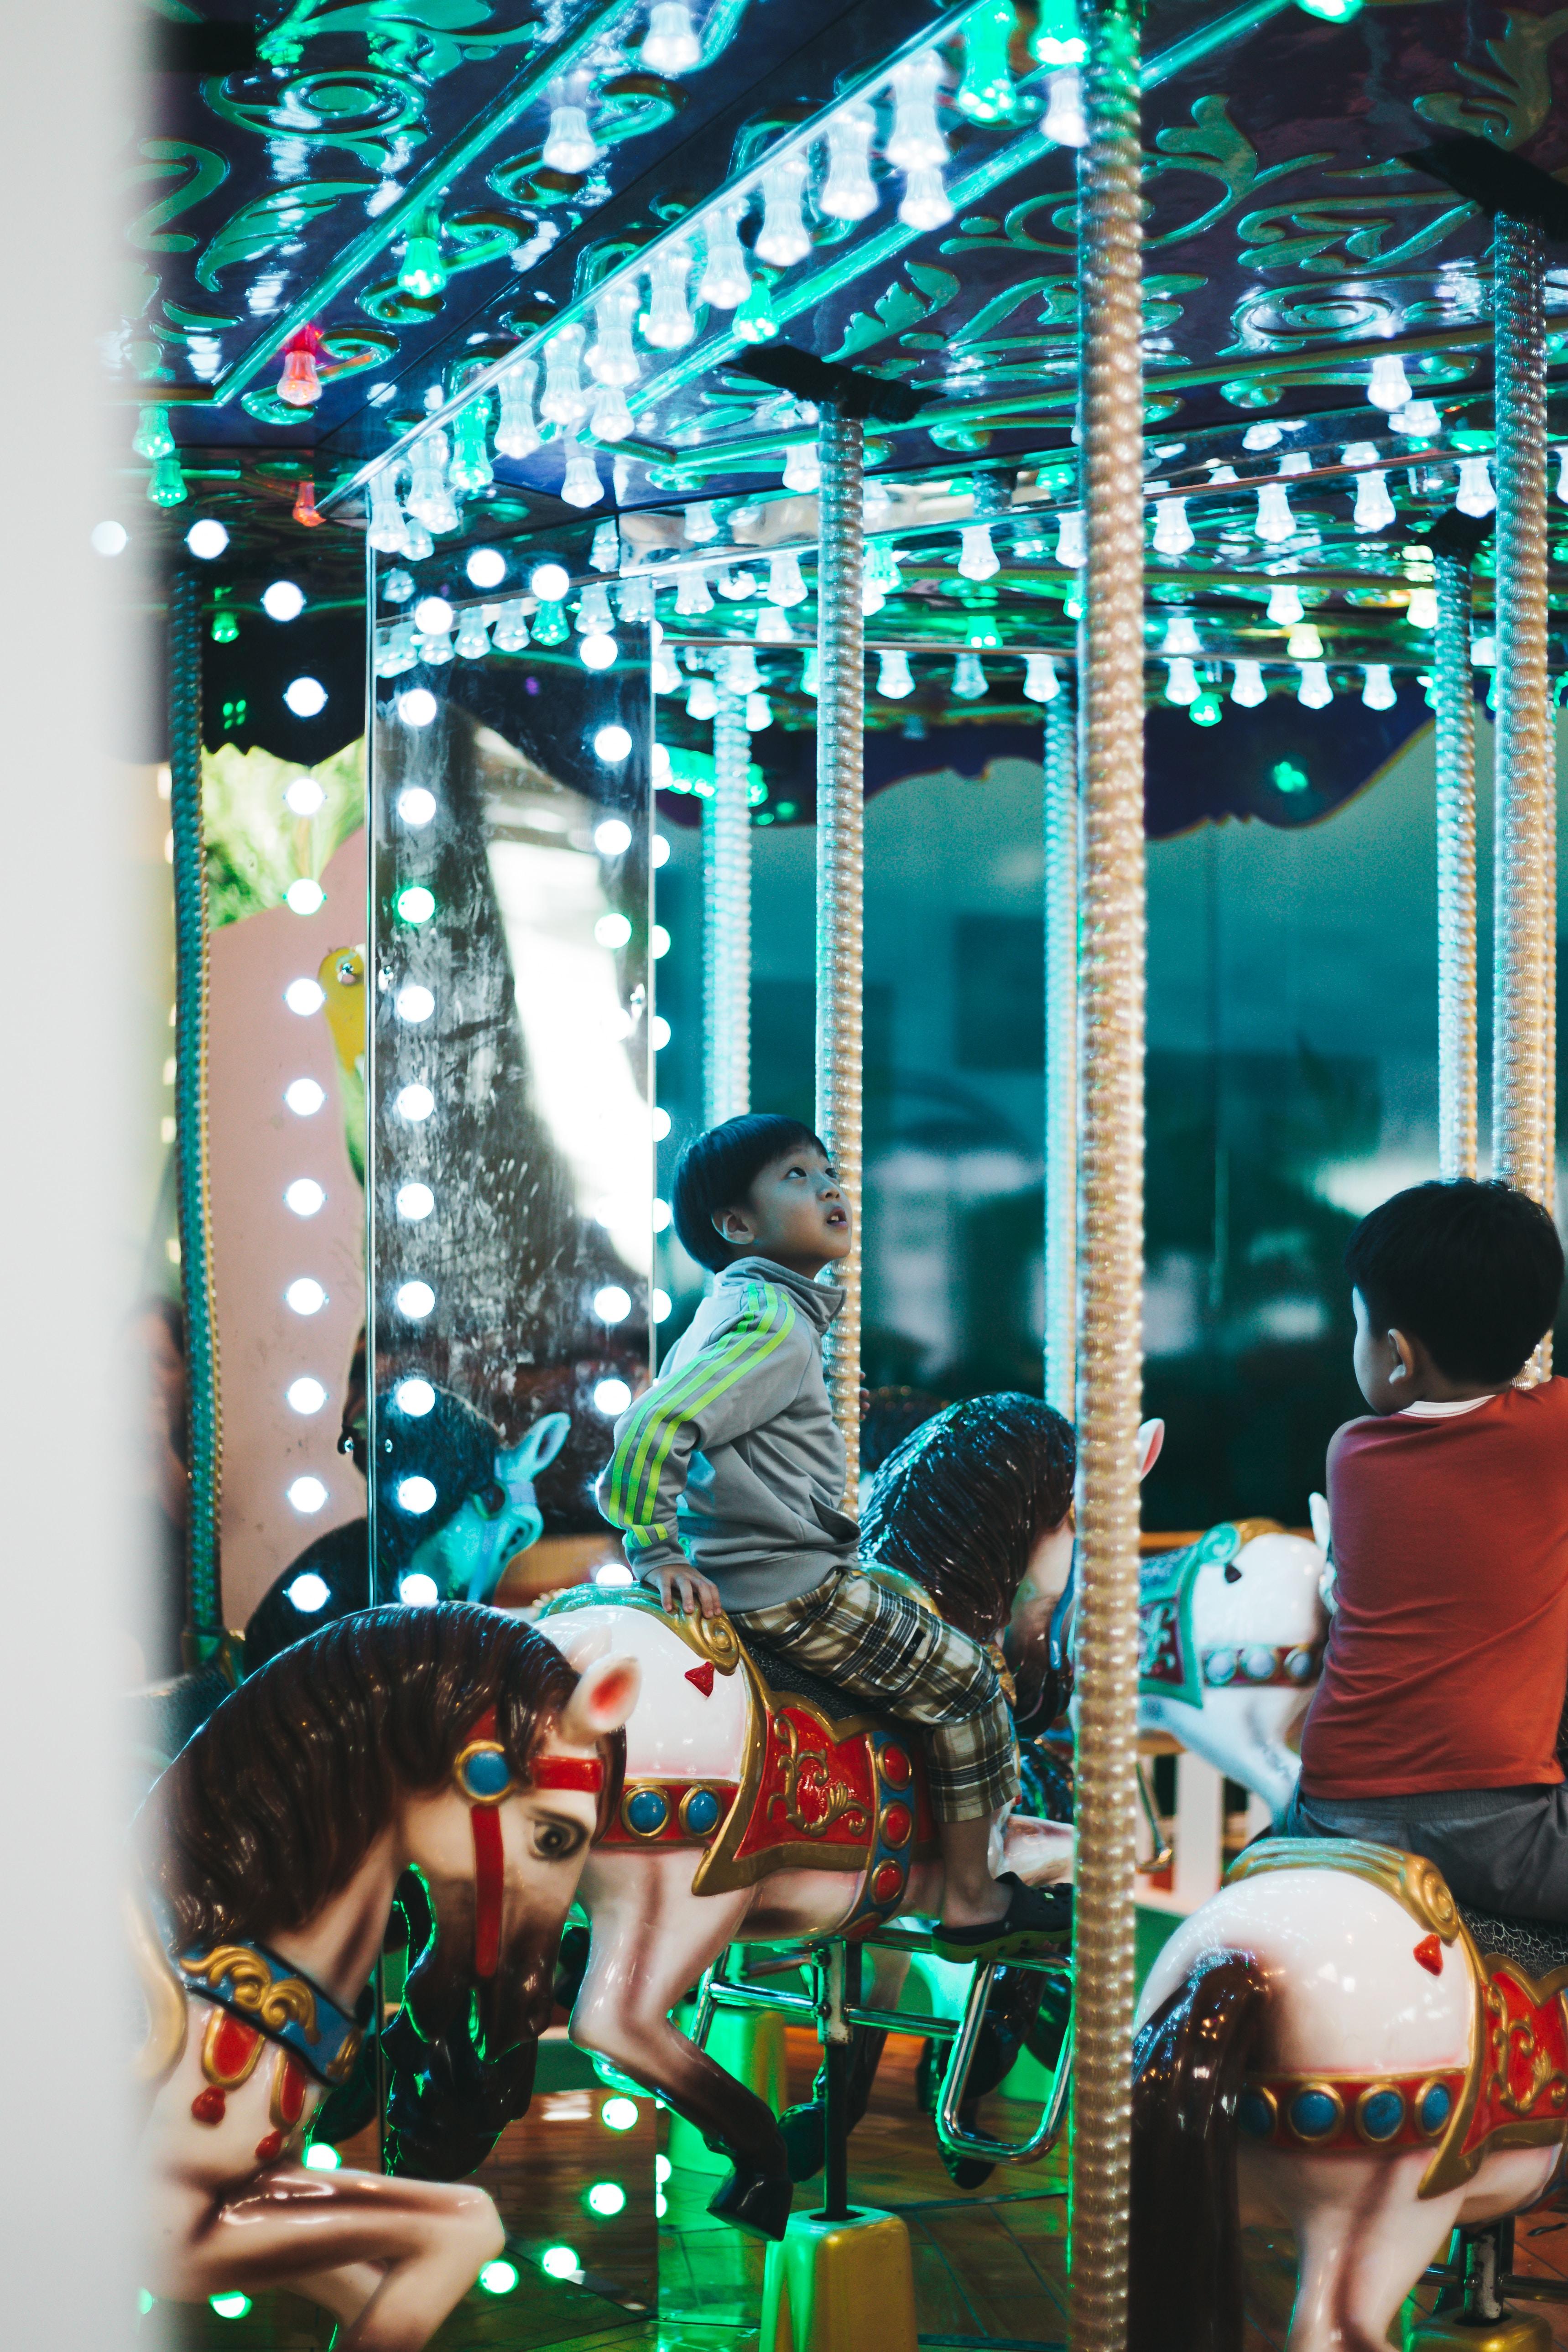 boy riding on carousel